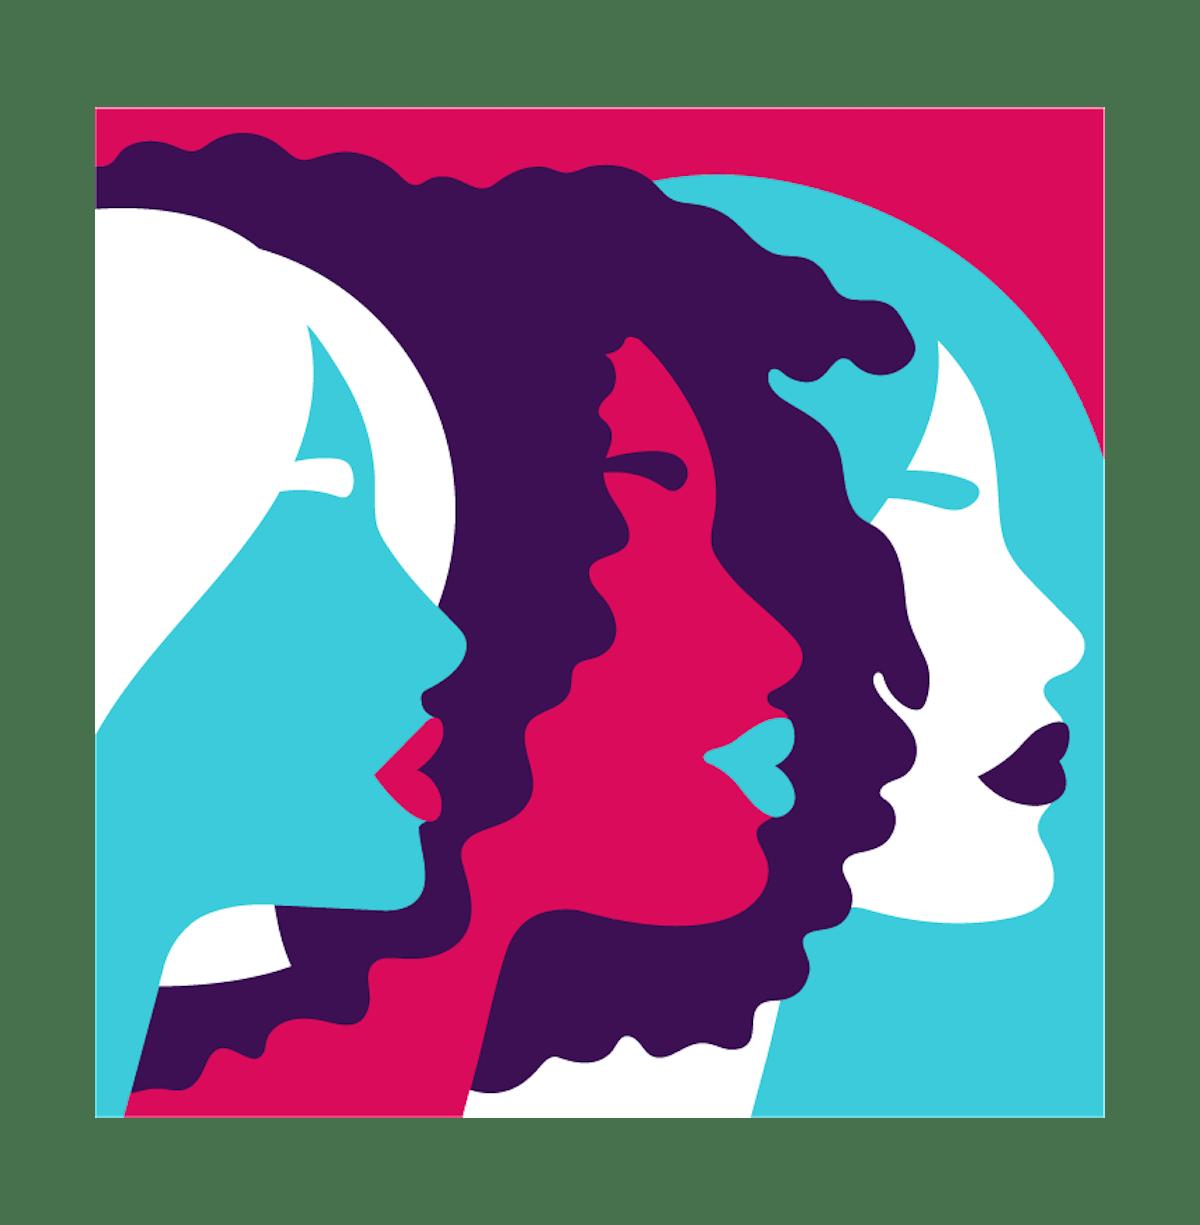 International Women's Day ERG logo